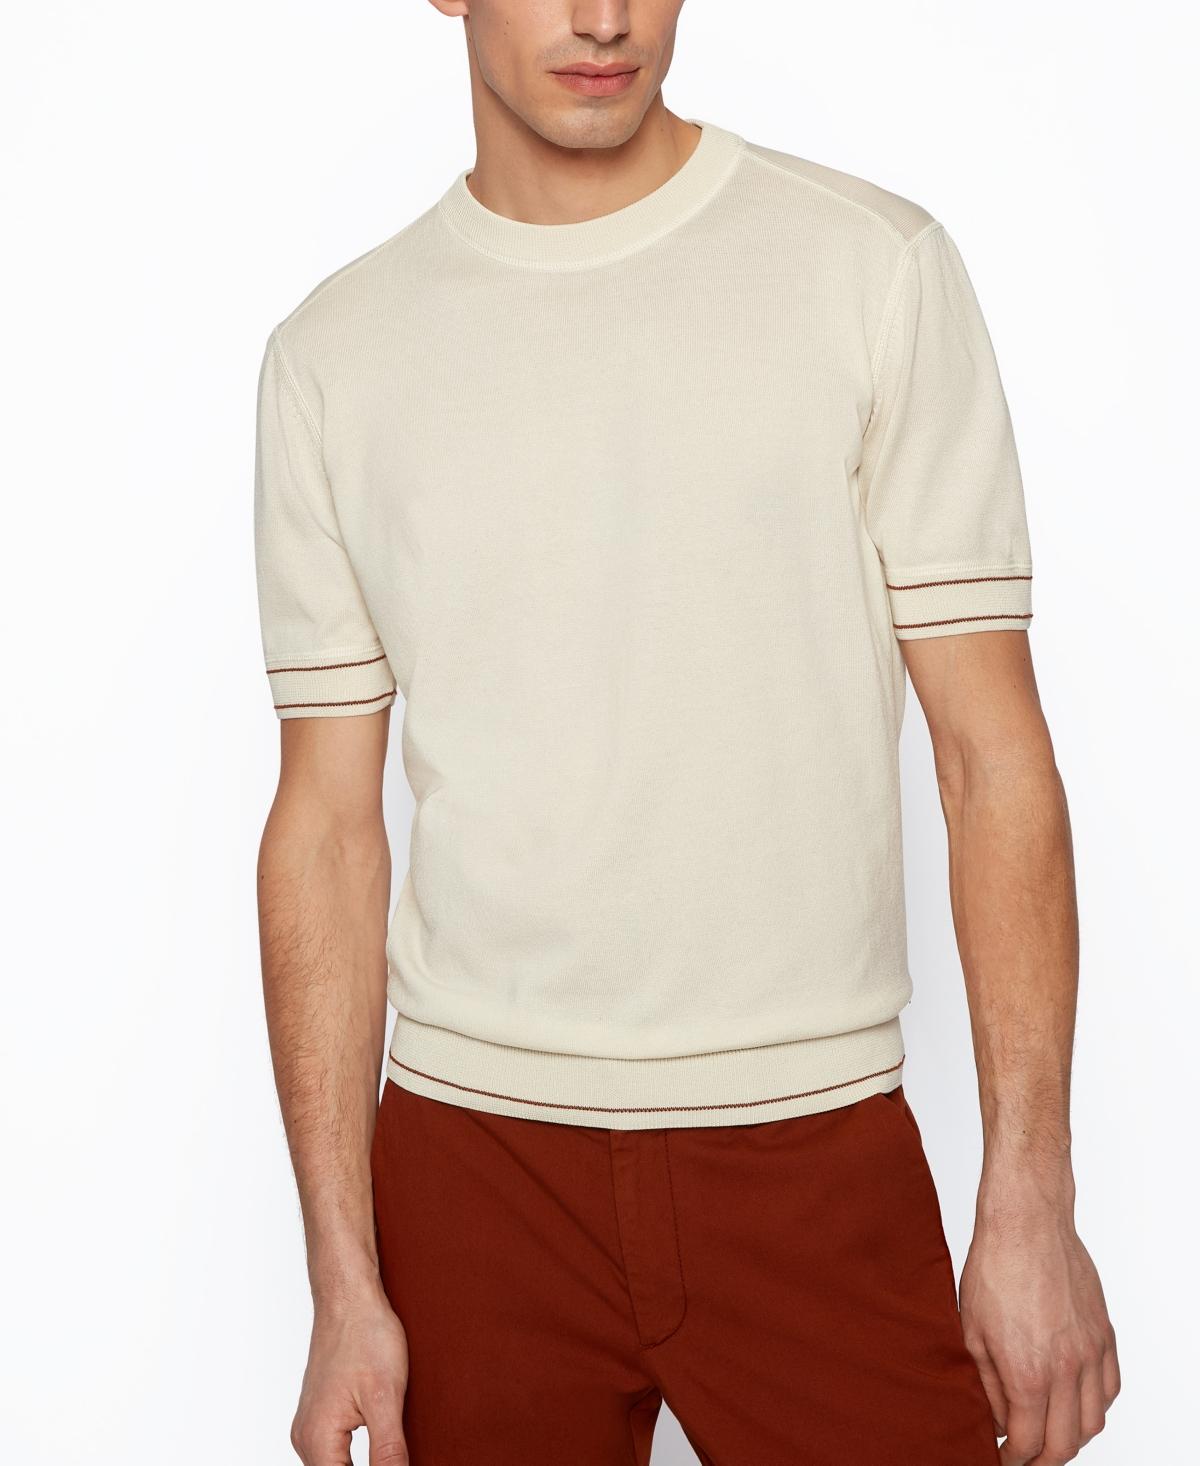 1960s Mens Shirts | 60s Mod Shirts, Hippie Shirts Boss Mens T-Shirt-Style Sweater $178.00 AT vintagedancer.com